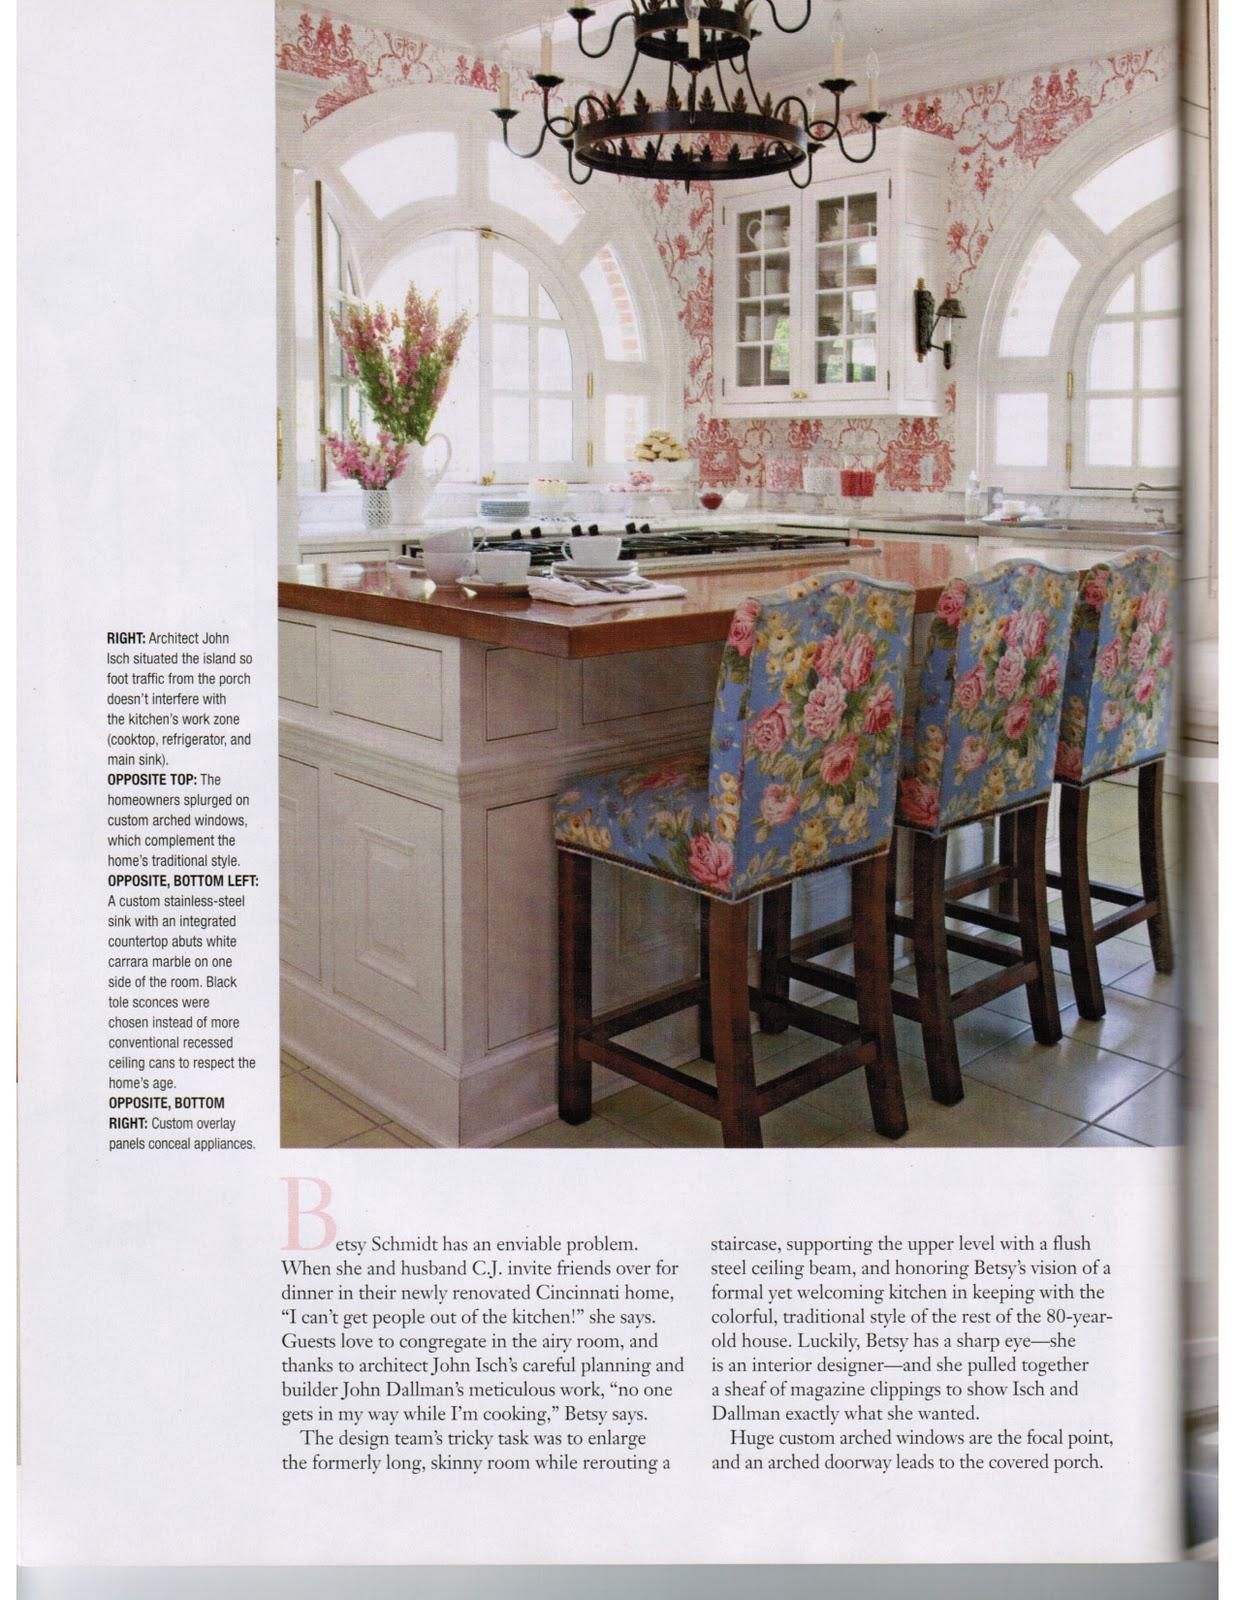 http://2.bp.blogspot.com/-9ky5nTxZ7u4/TwxDBsNmY4I/AAAAAAAAK5c/dTUSpiVCY7c/s1600/kitchen+toile2.jpg